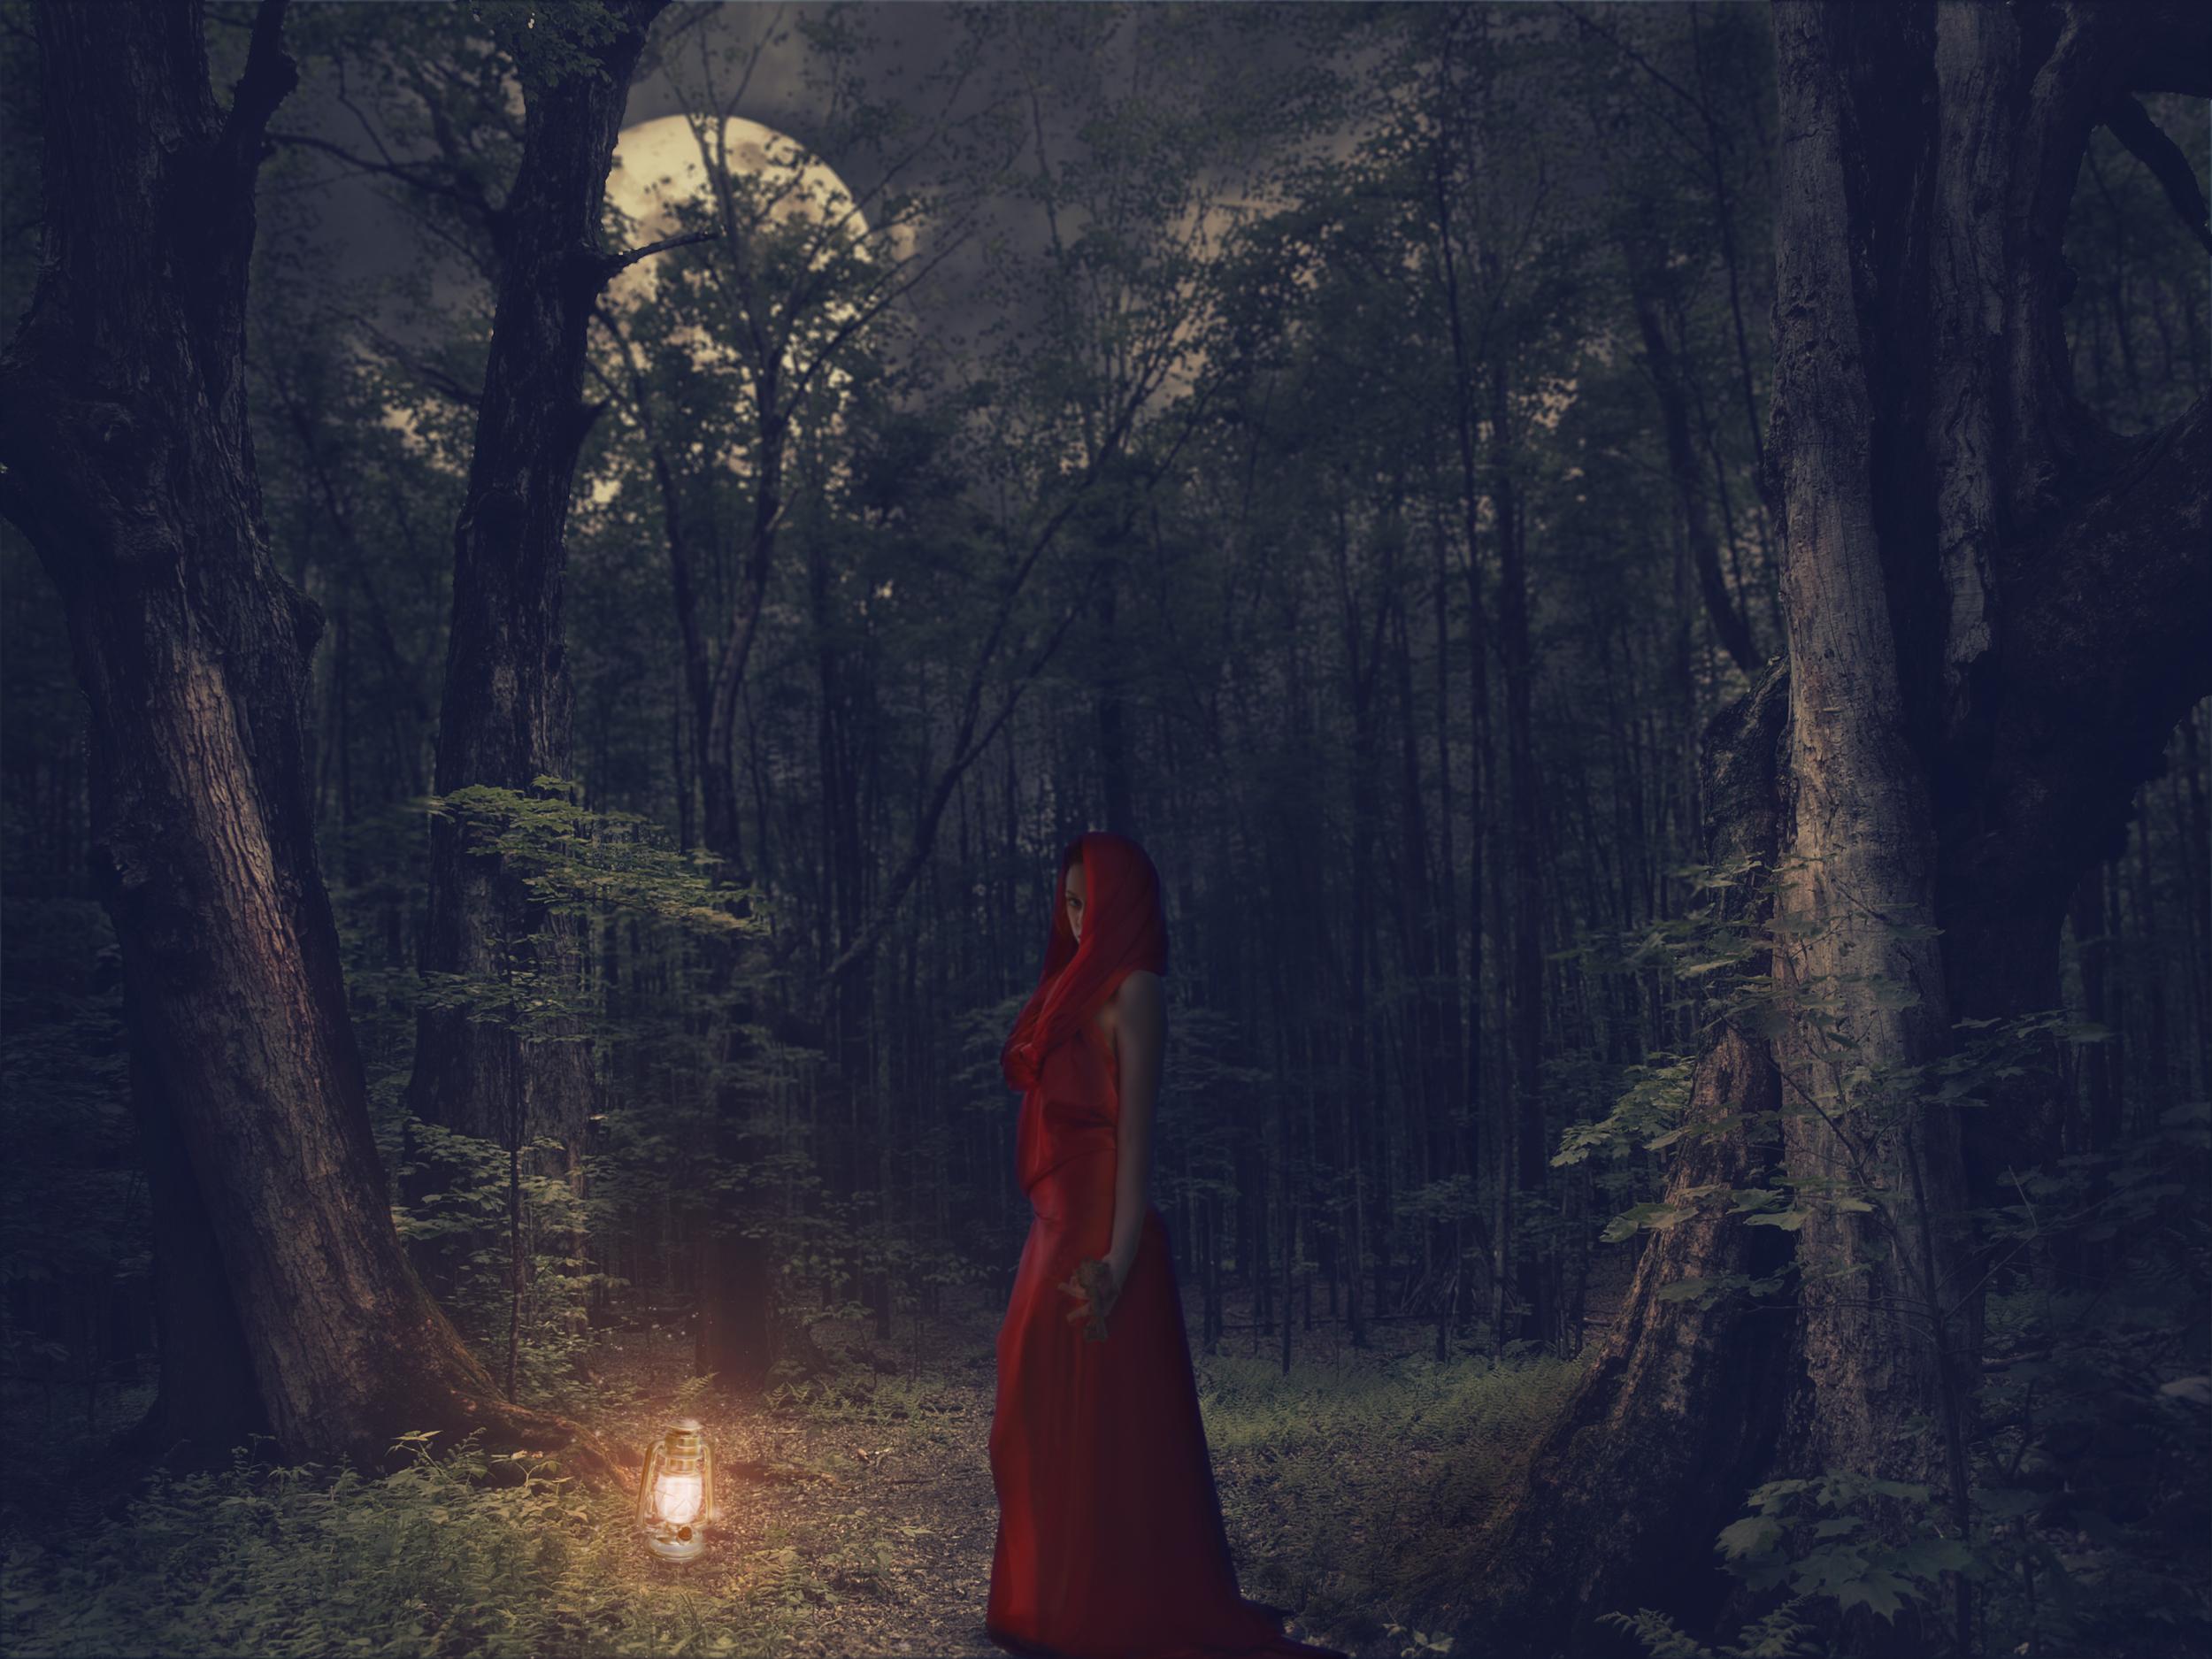 forest_after.jpg